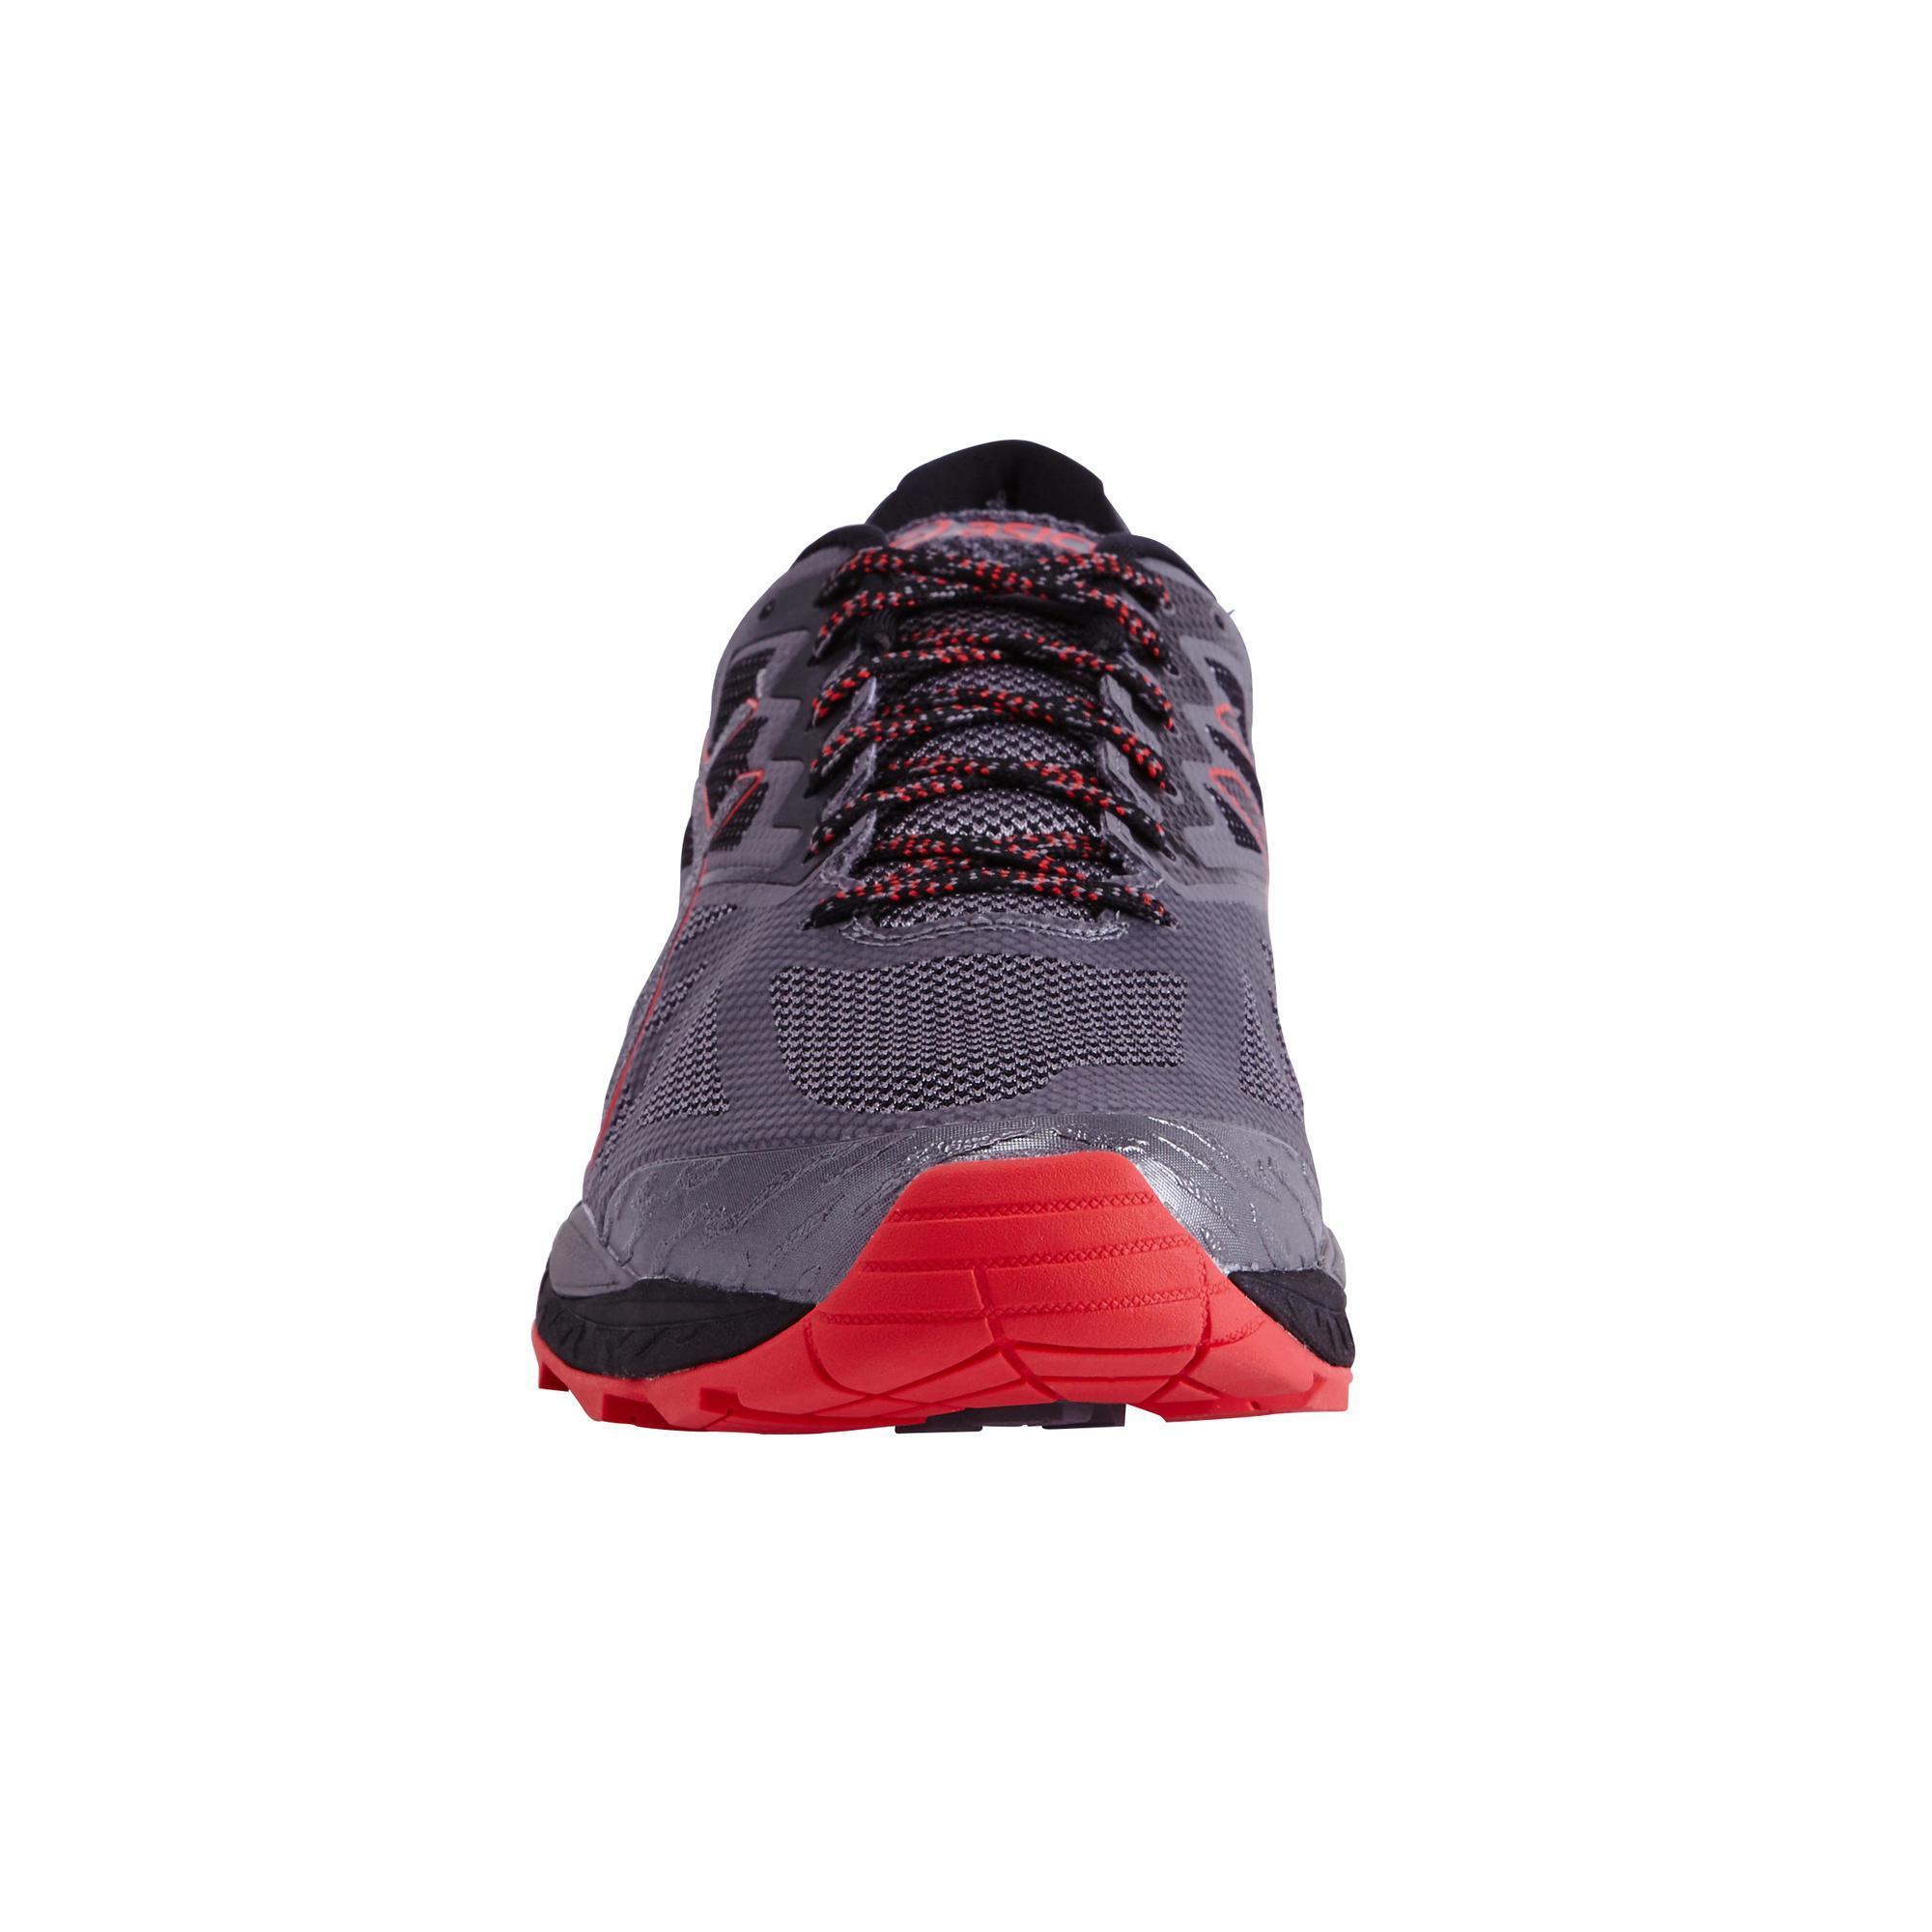 reputable site 62924 b10b9 Asics Gel Homme Trail Fujitrabuco Decathlon Bleu 6 Chaussures gqr4xg